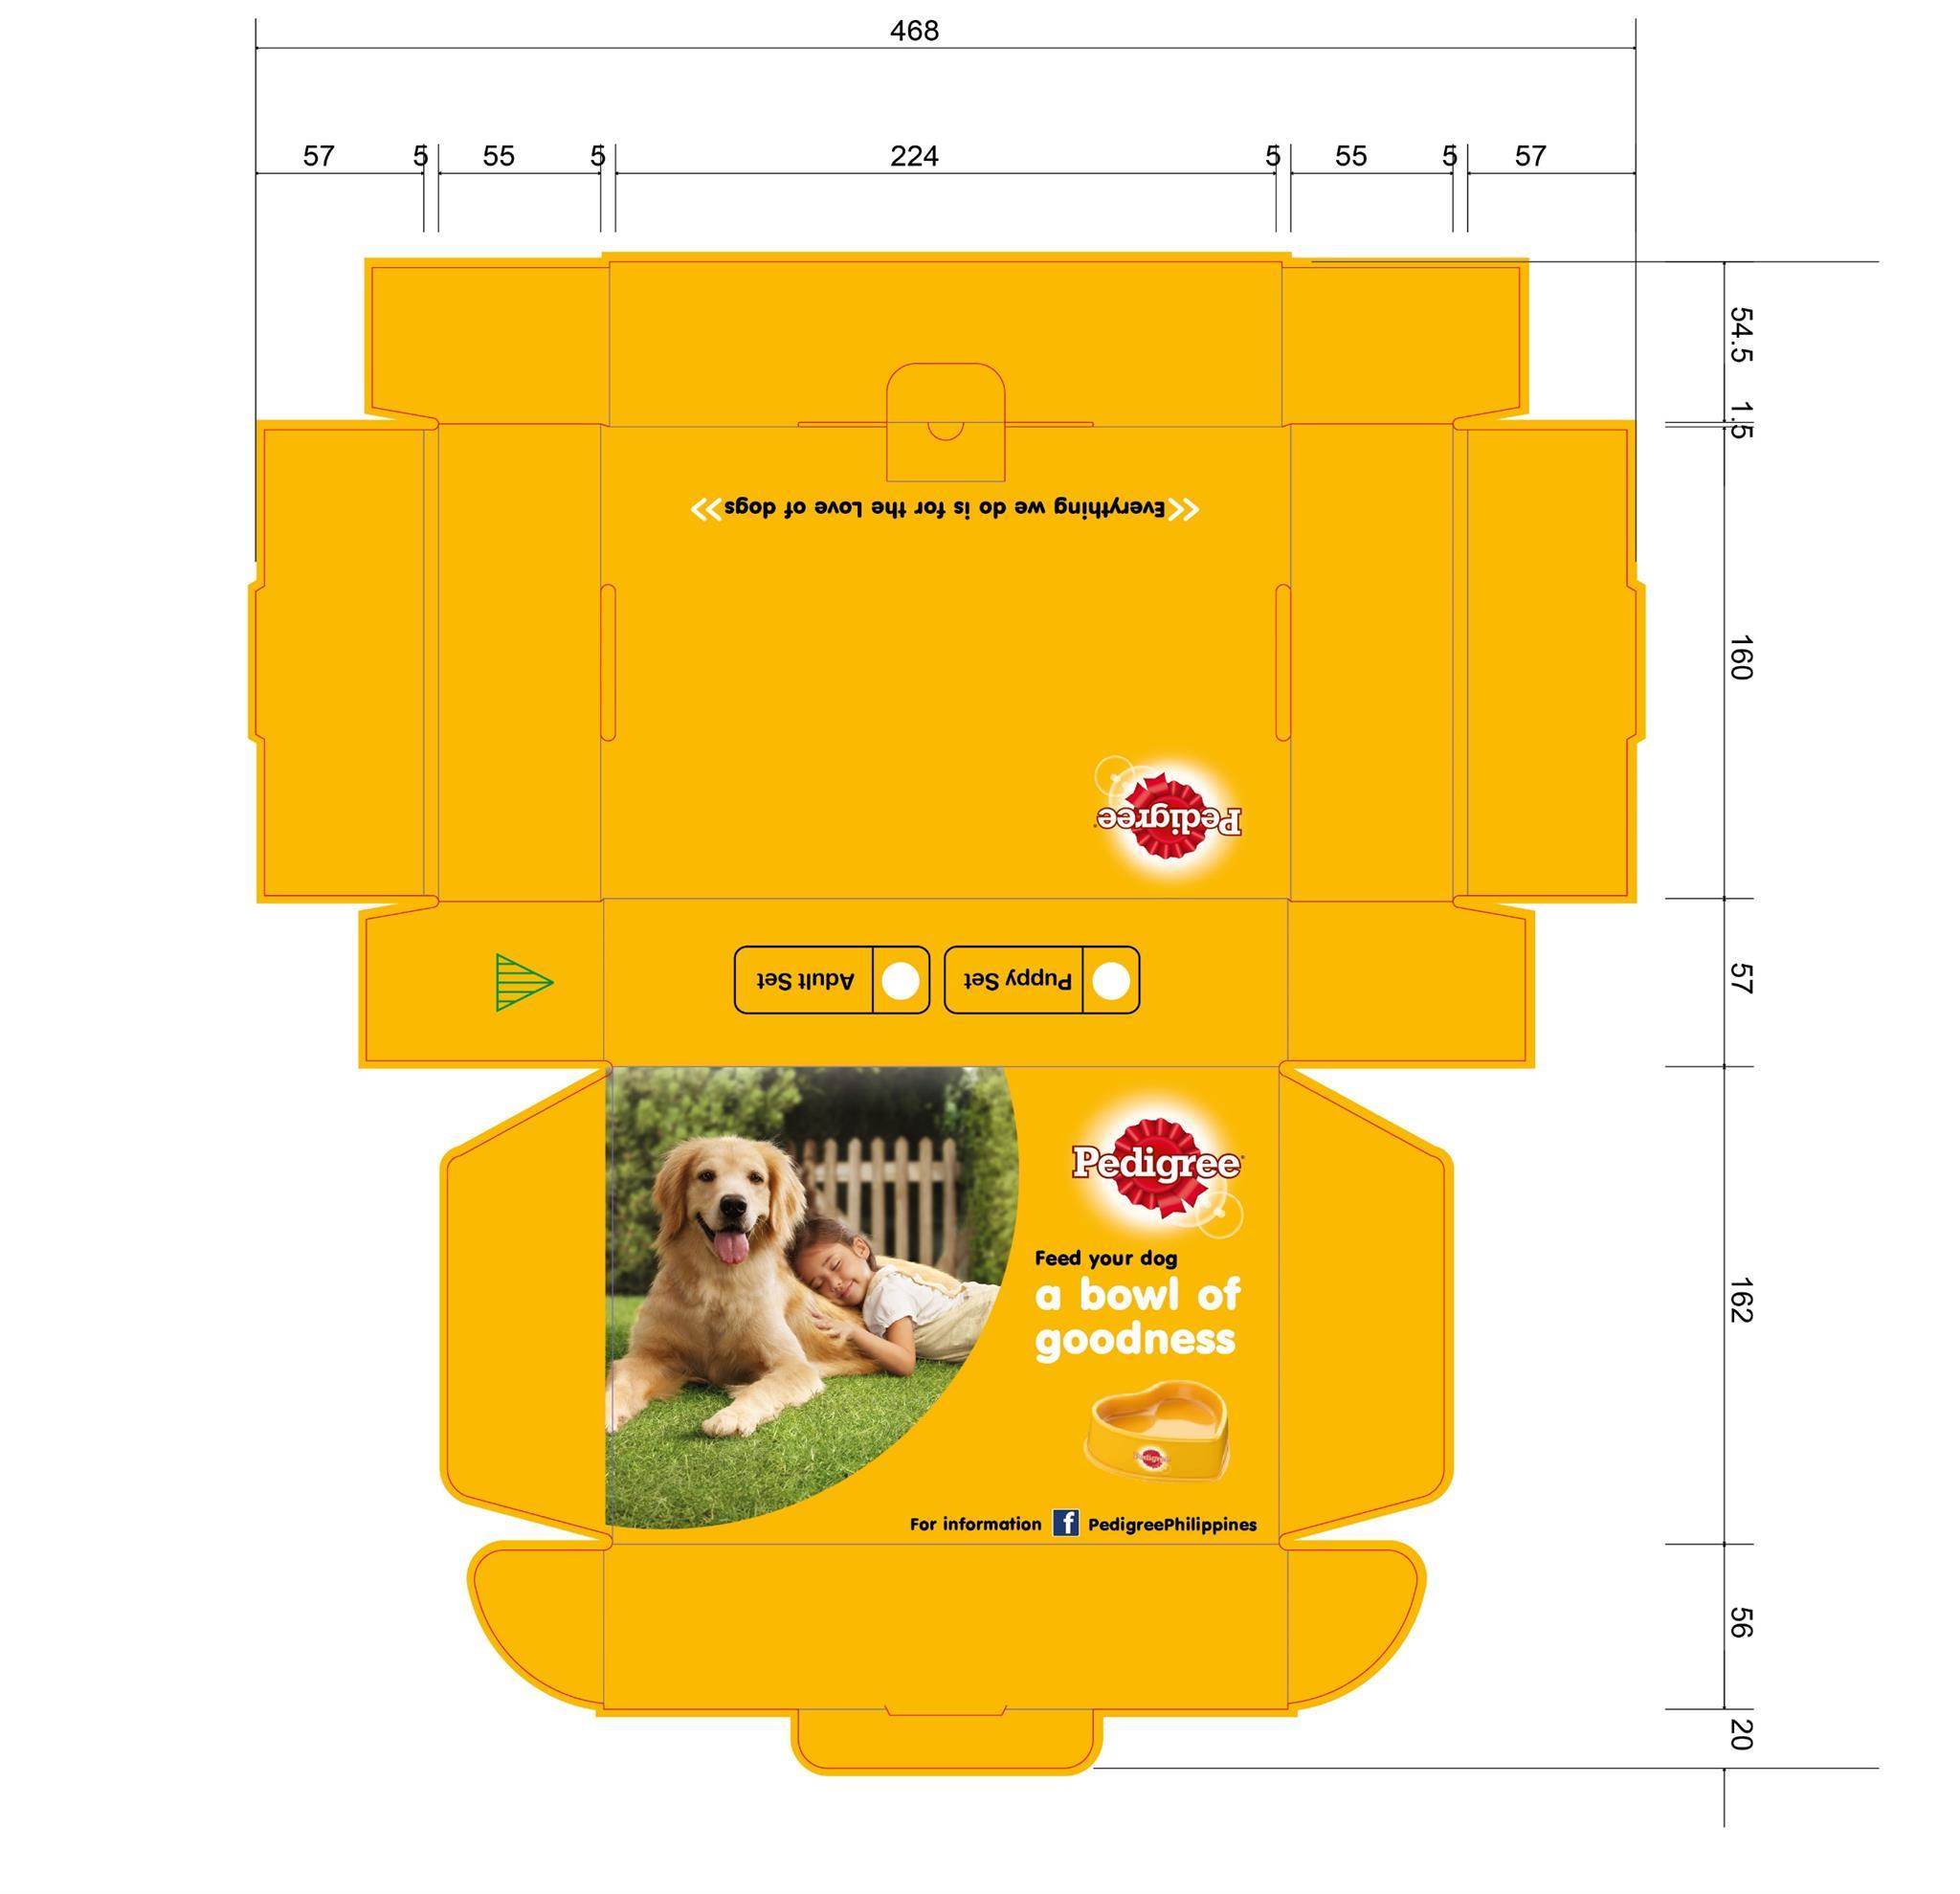 predigree-box-design